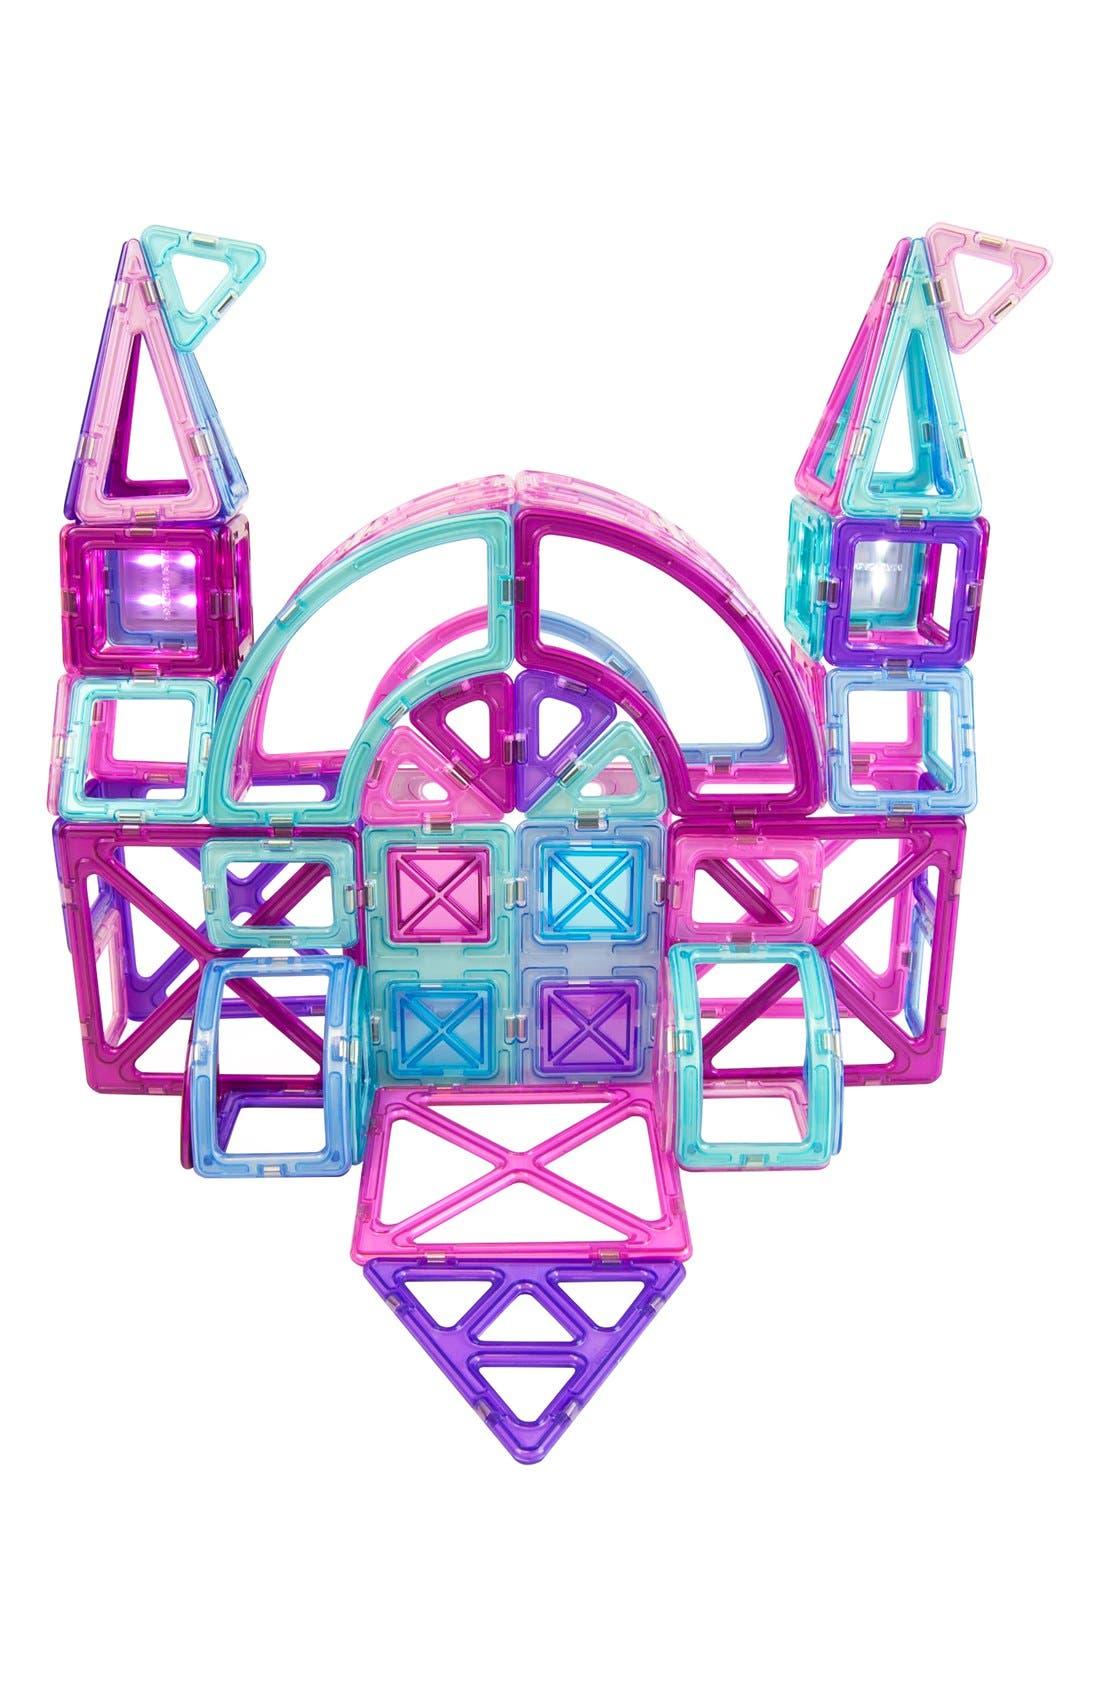 'Inspire' Magnetic Construction Set,                             Alternate thumbnail 2, color,                             Pink/ Purple/ Teal